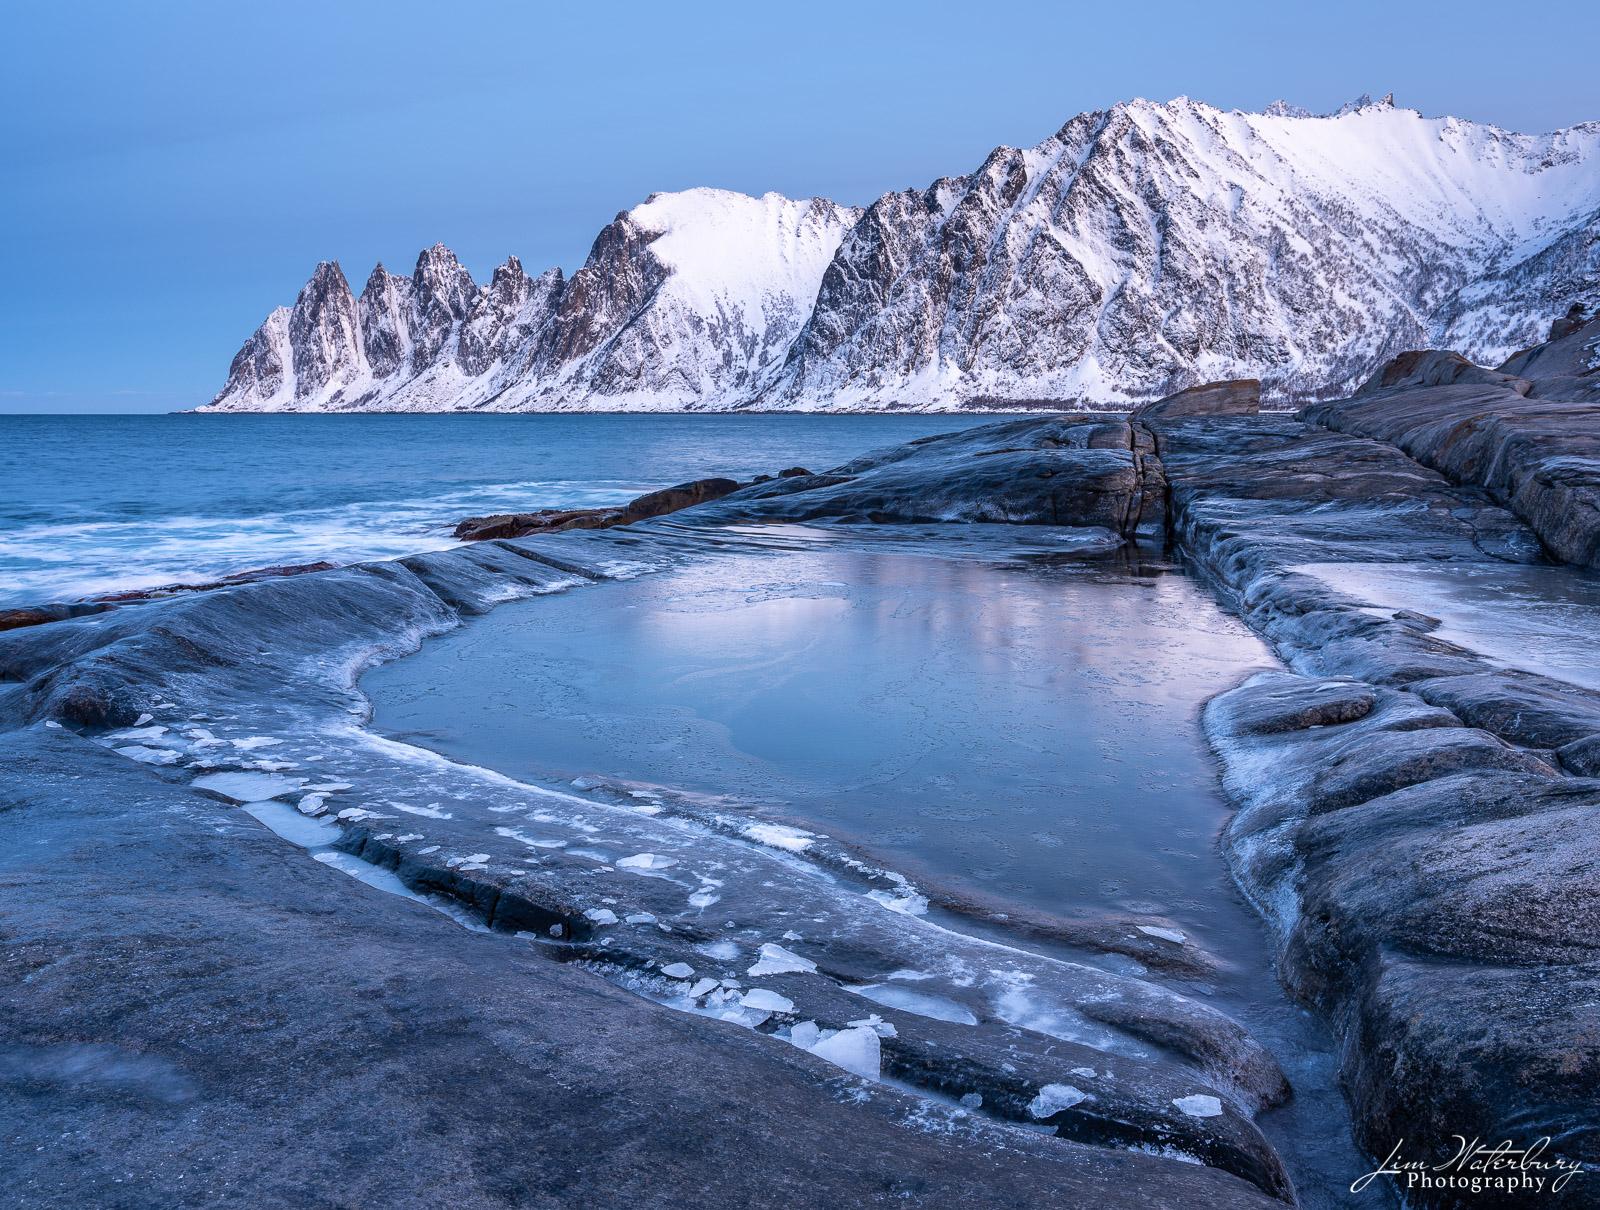 Tungeneset, Senja, Lofoten Islands, Norway, early morning shoot from rocky viewpoint